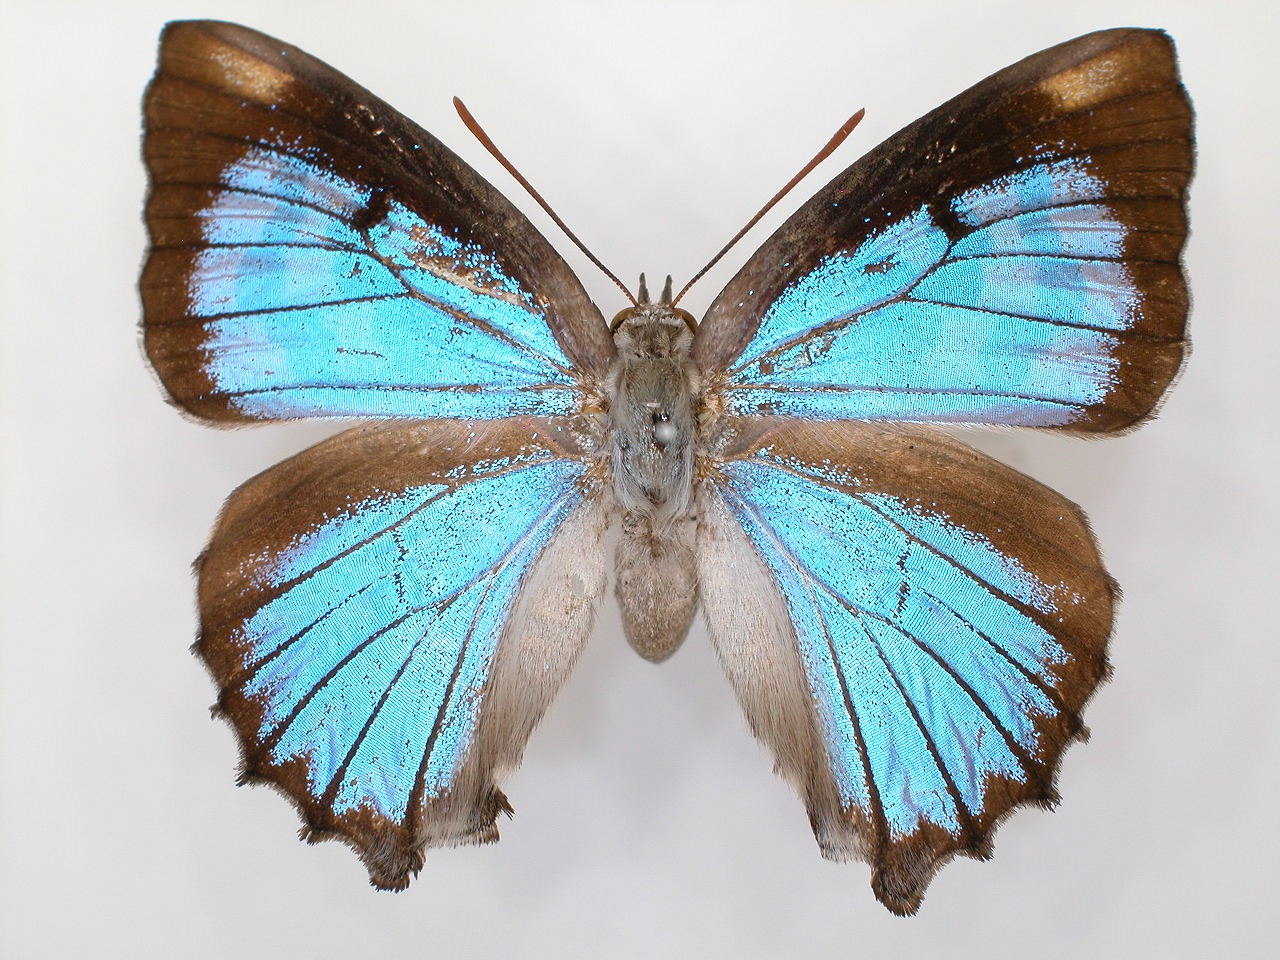 https://www.hitohaku.jp/material/l-material/butterfly-wing/5-lycaenidae/B1-272073_A.jpg